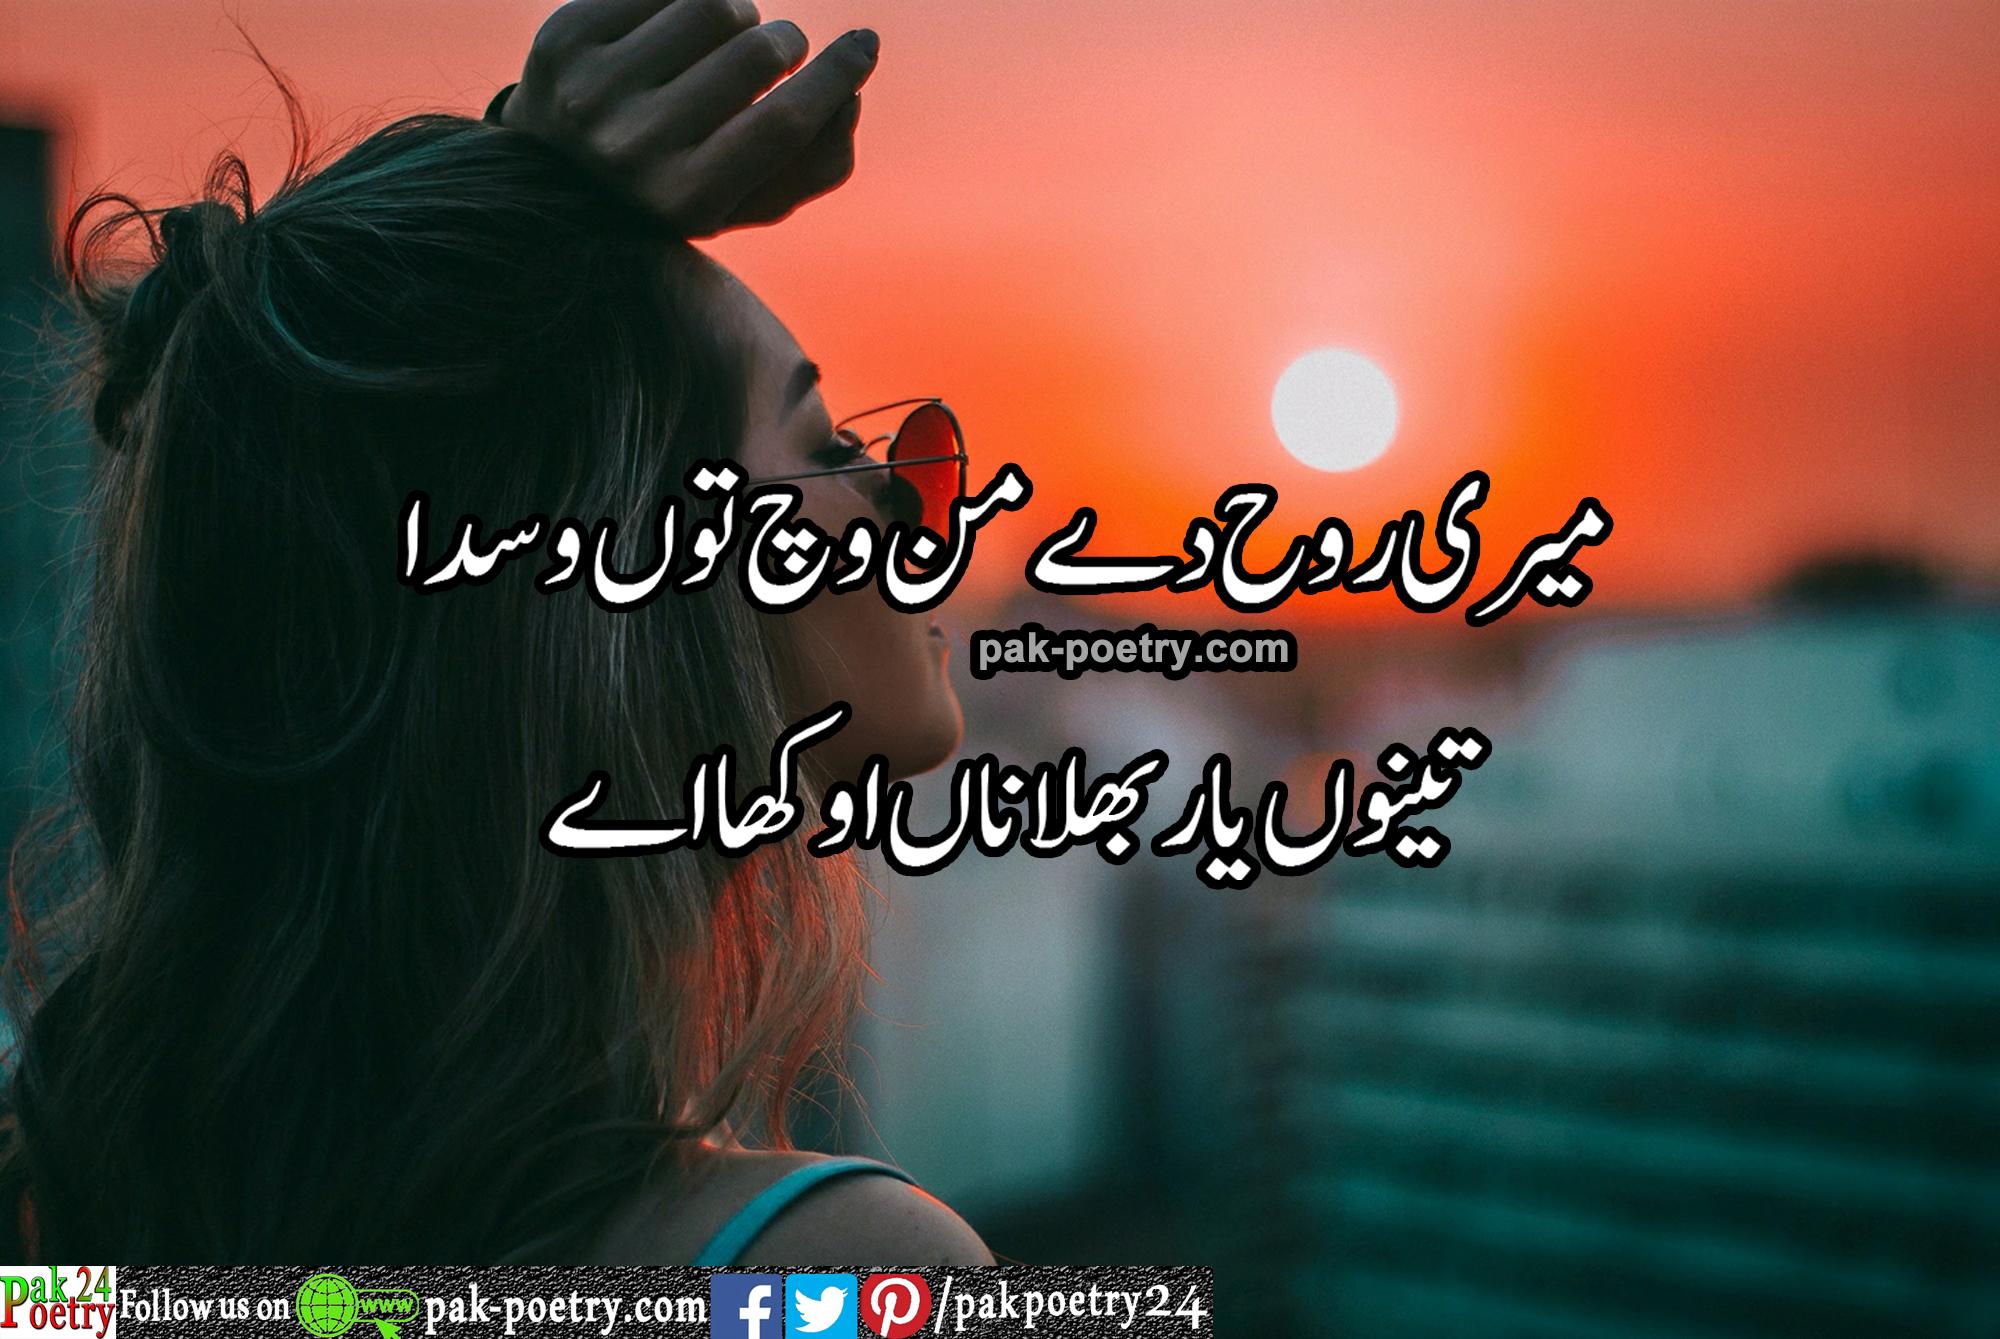 Love poetry, love poetry in urdu, love poetry urdu, urdu love poetry, poetry love, love poetry pics, love poetries, lovepoetry, punjabi poetry, poetry punjabi, poetry in punjabi, punjabi poetry pics,